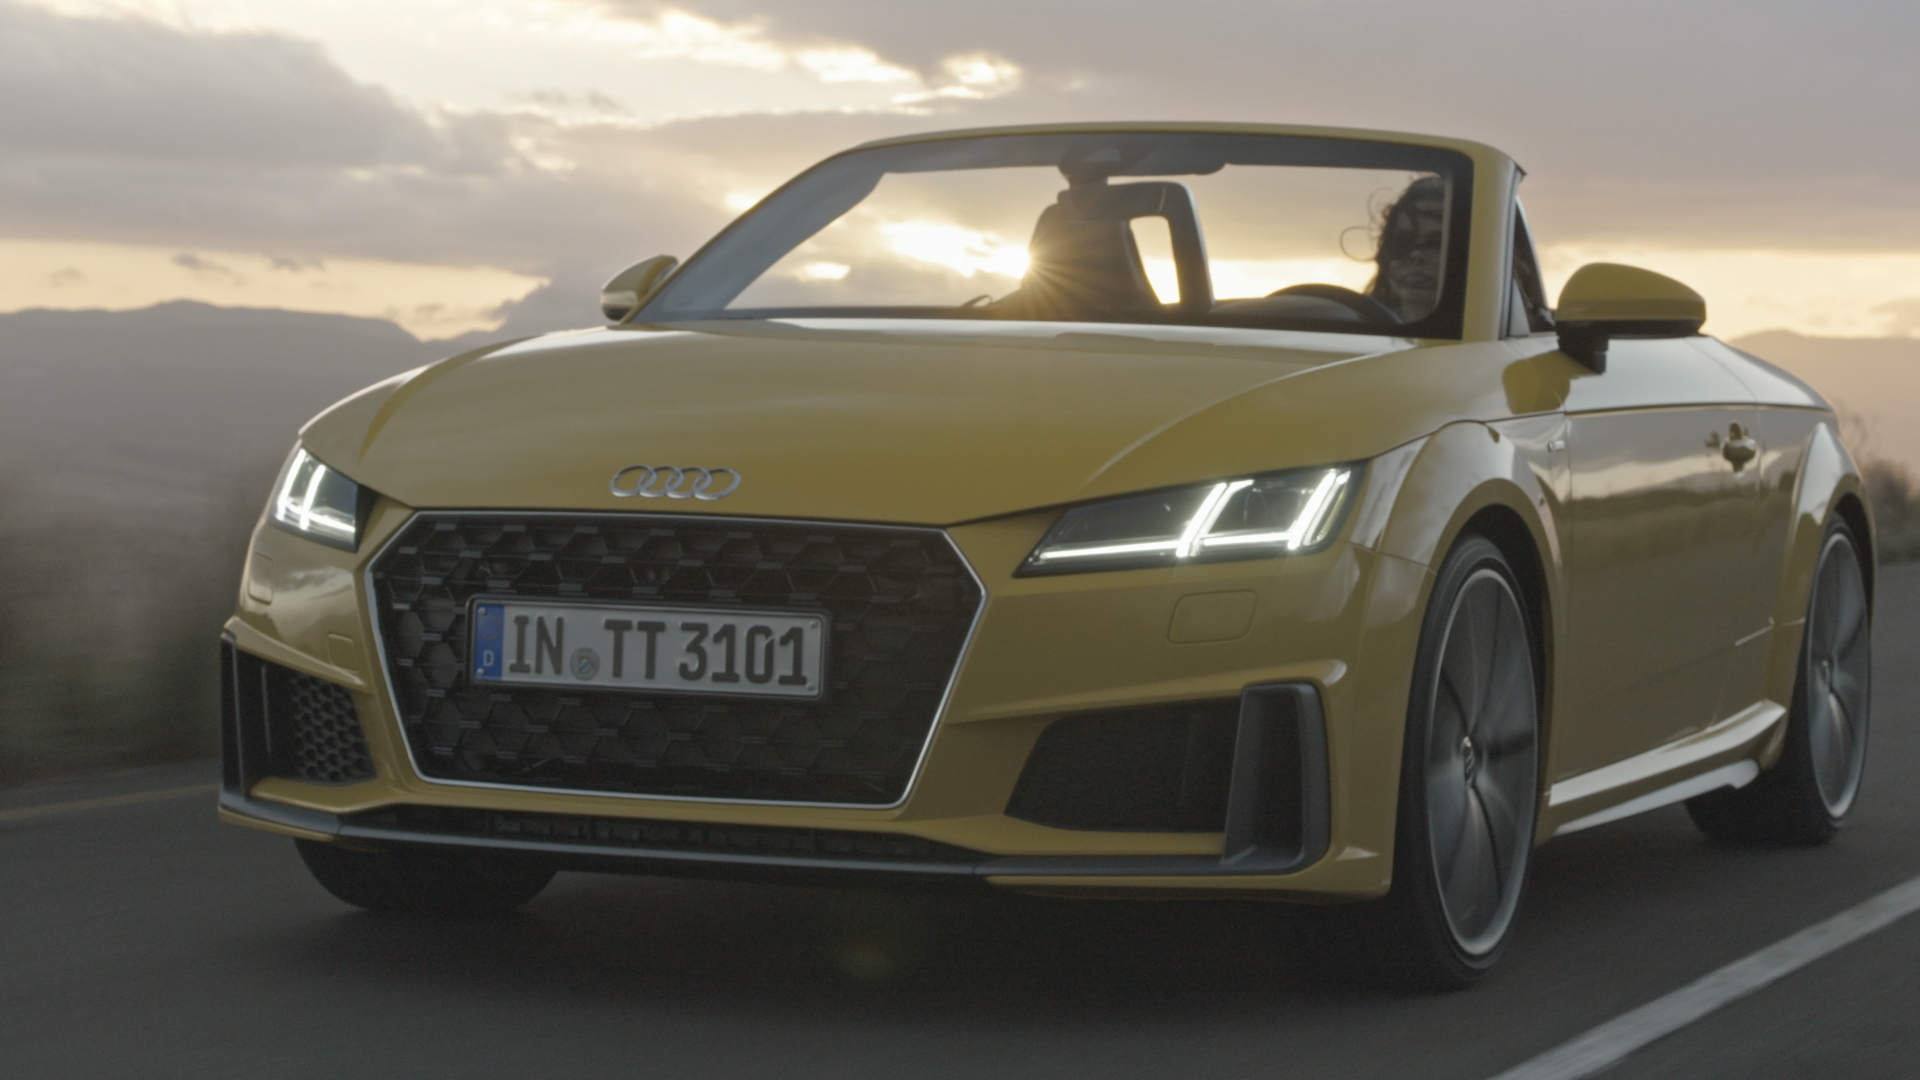 More masculine, more progressive and sportier – The new Audi TT Roadster